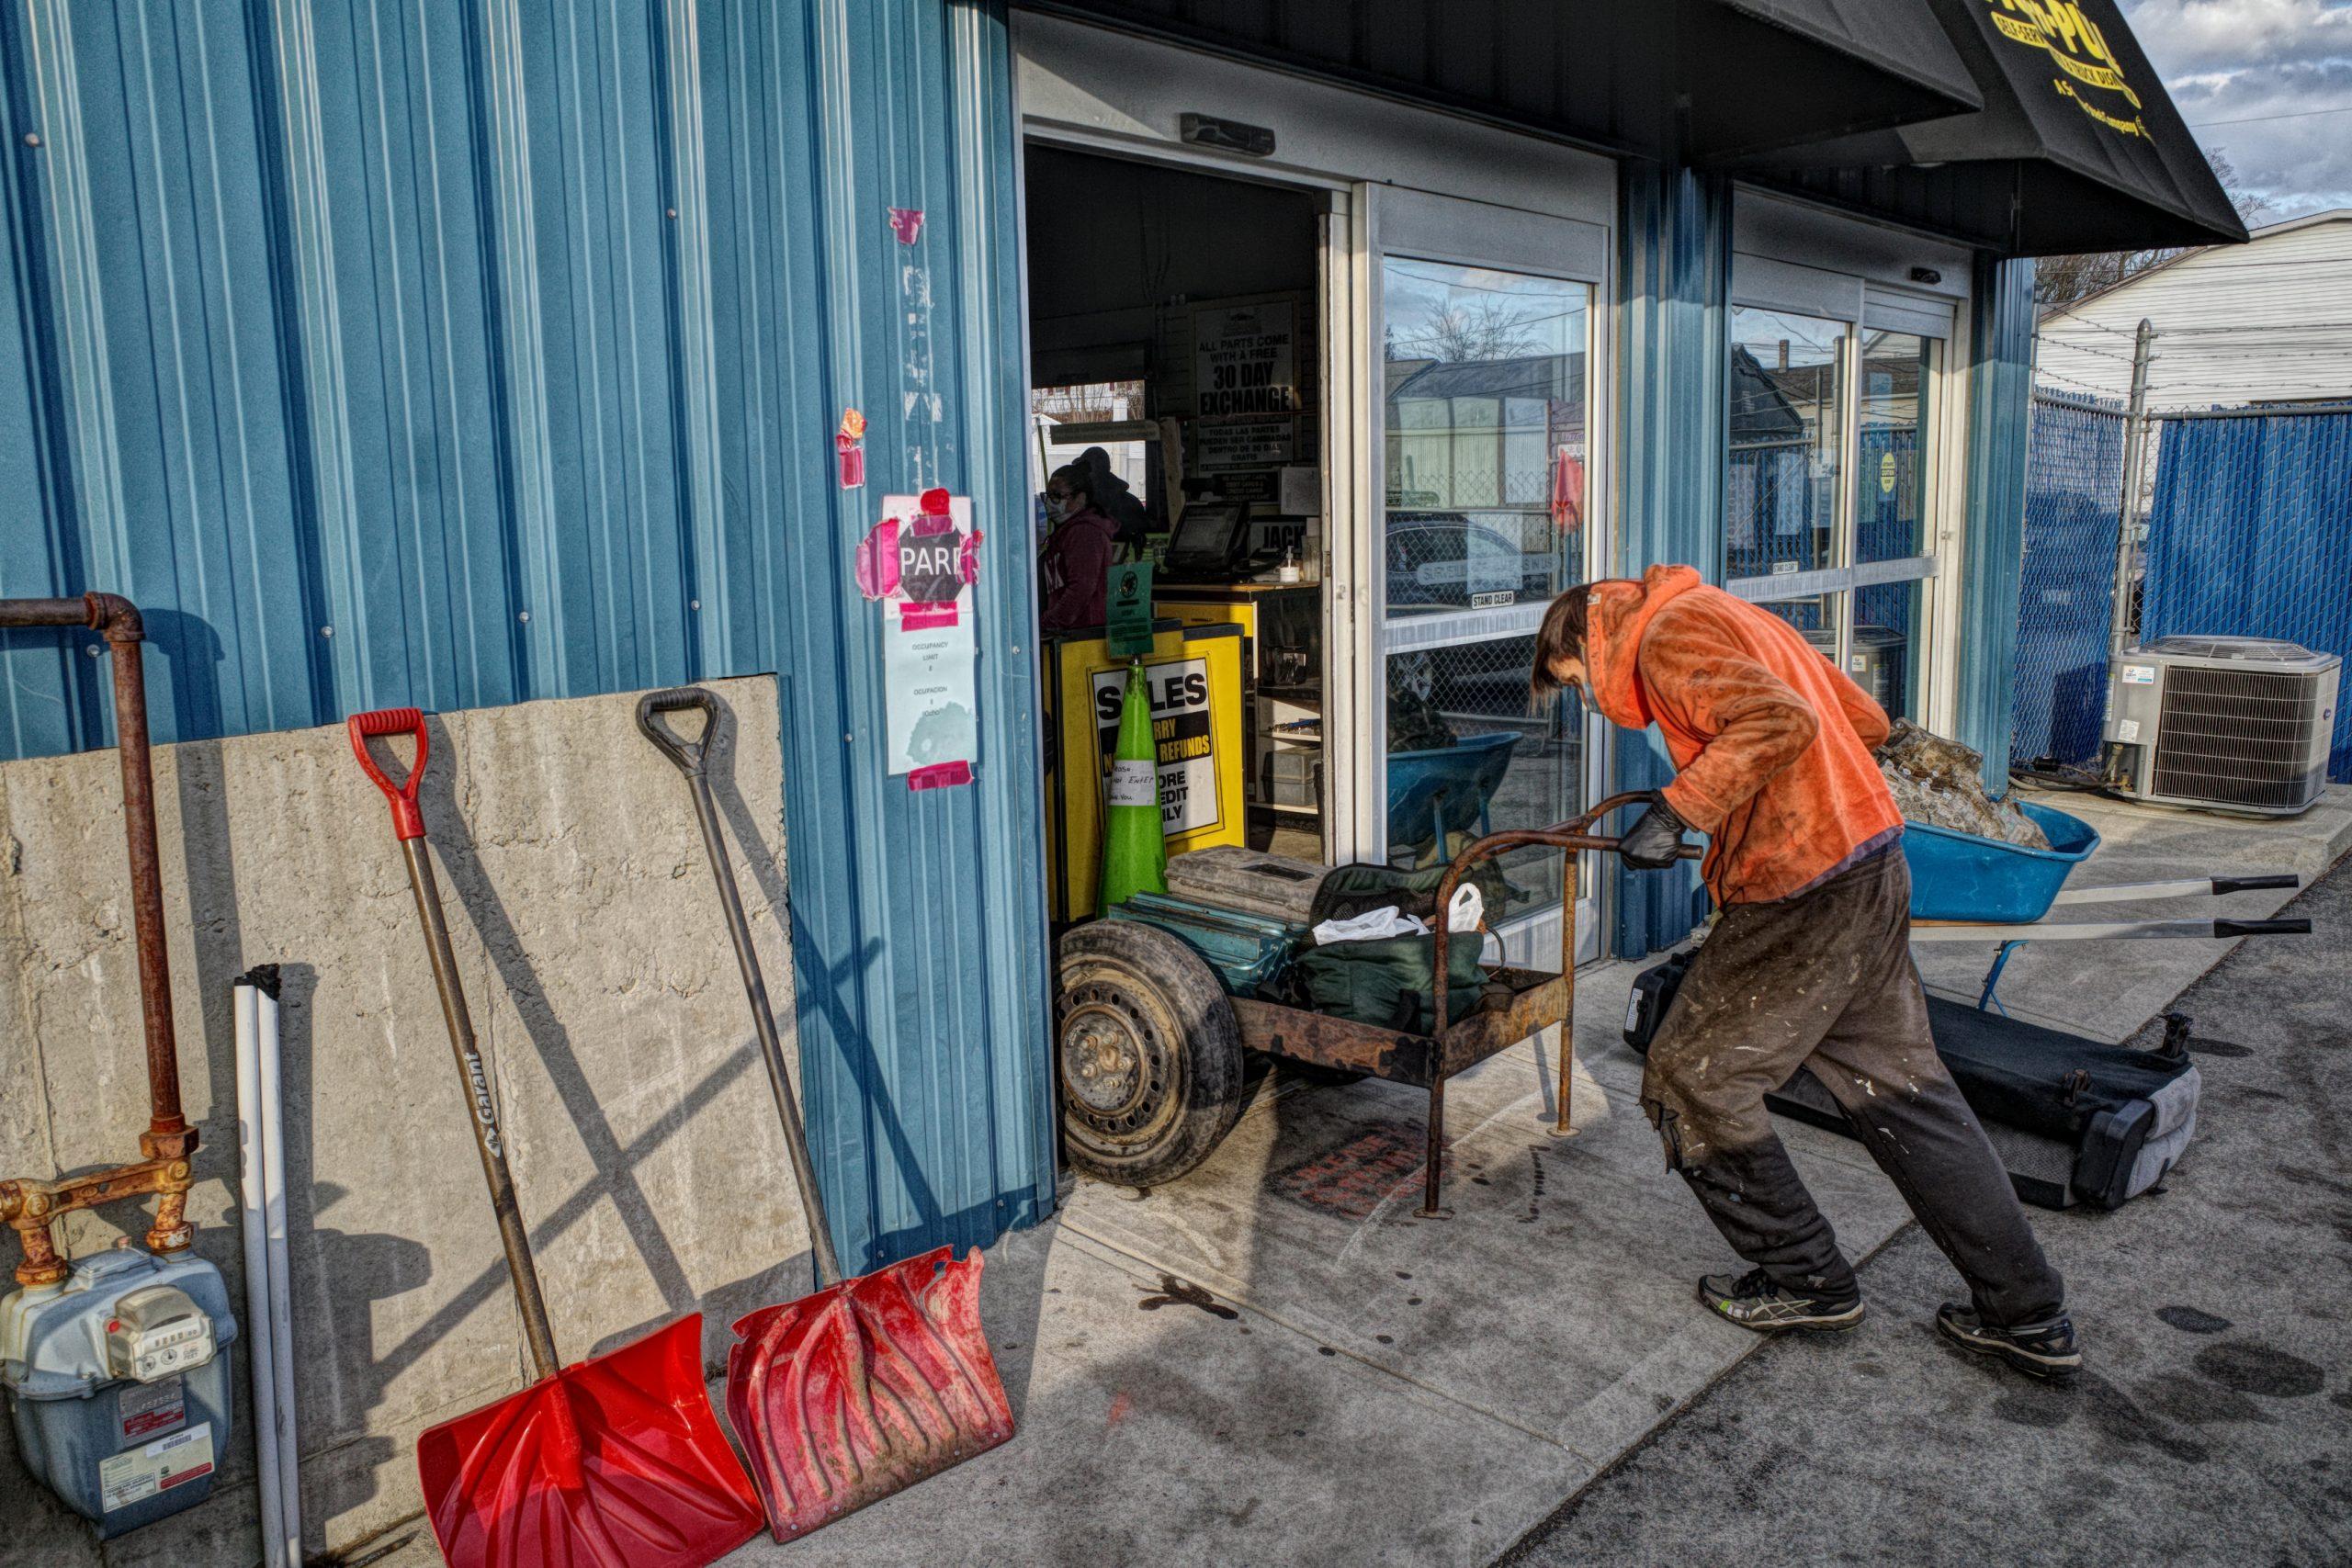 HDR junkyard photography street